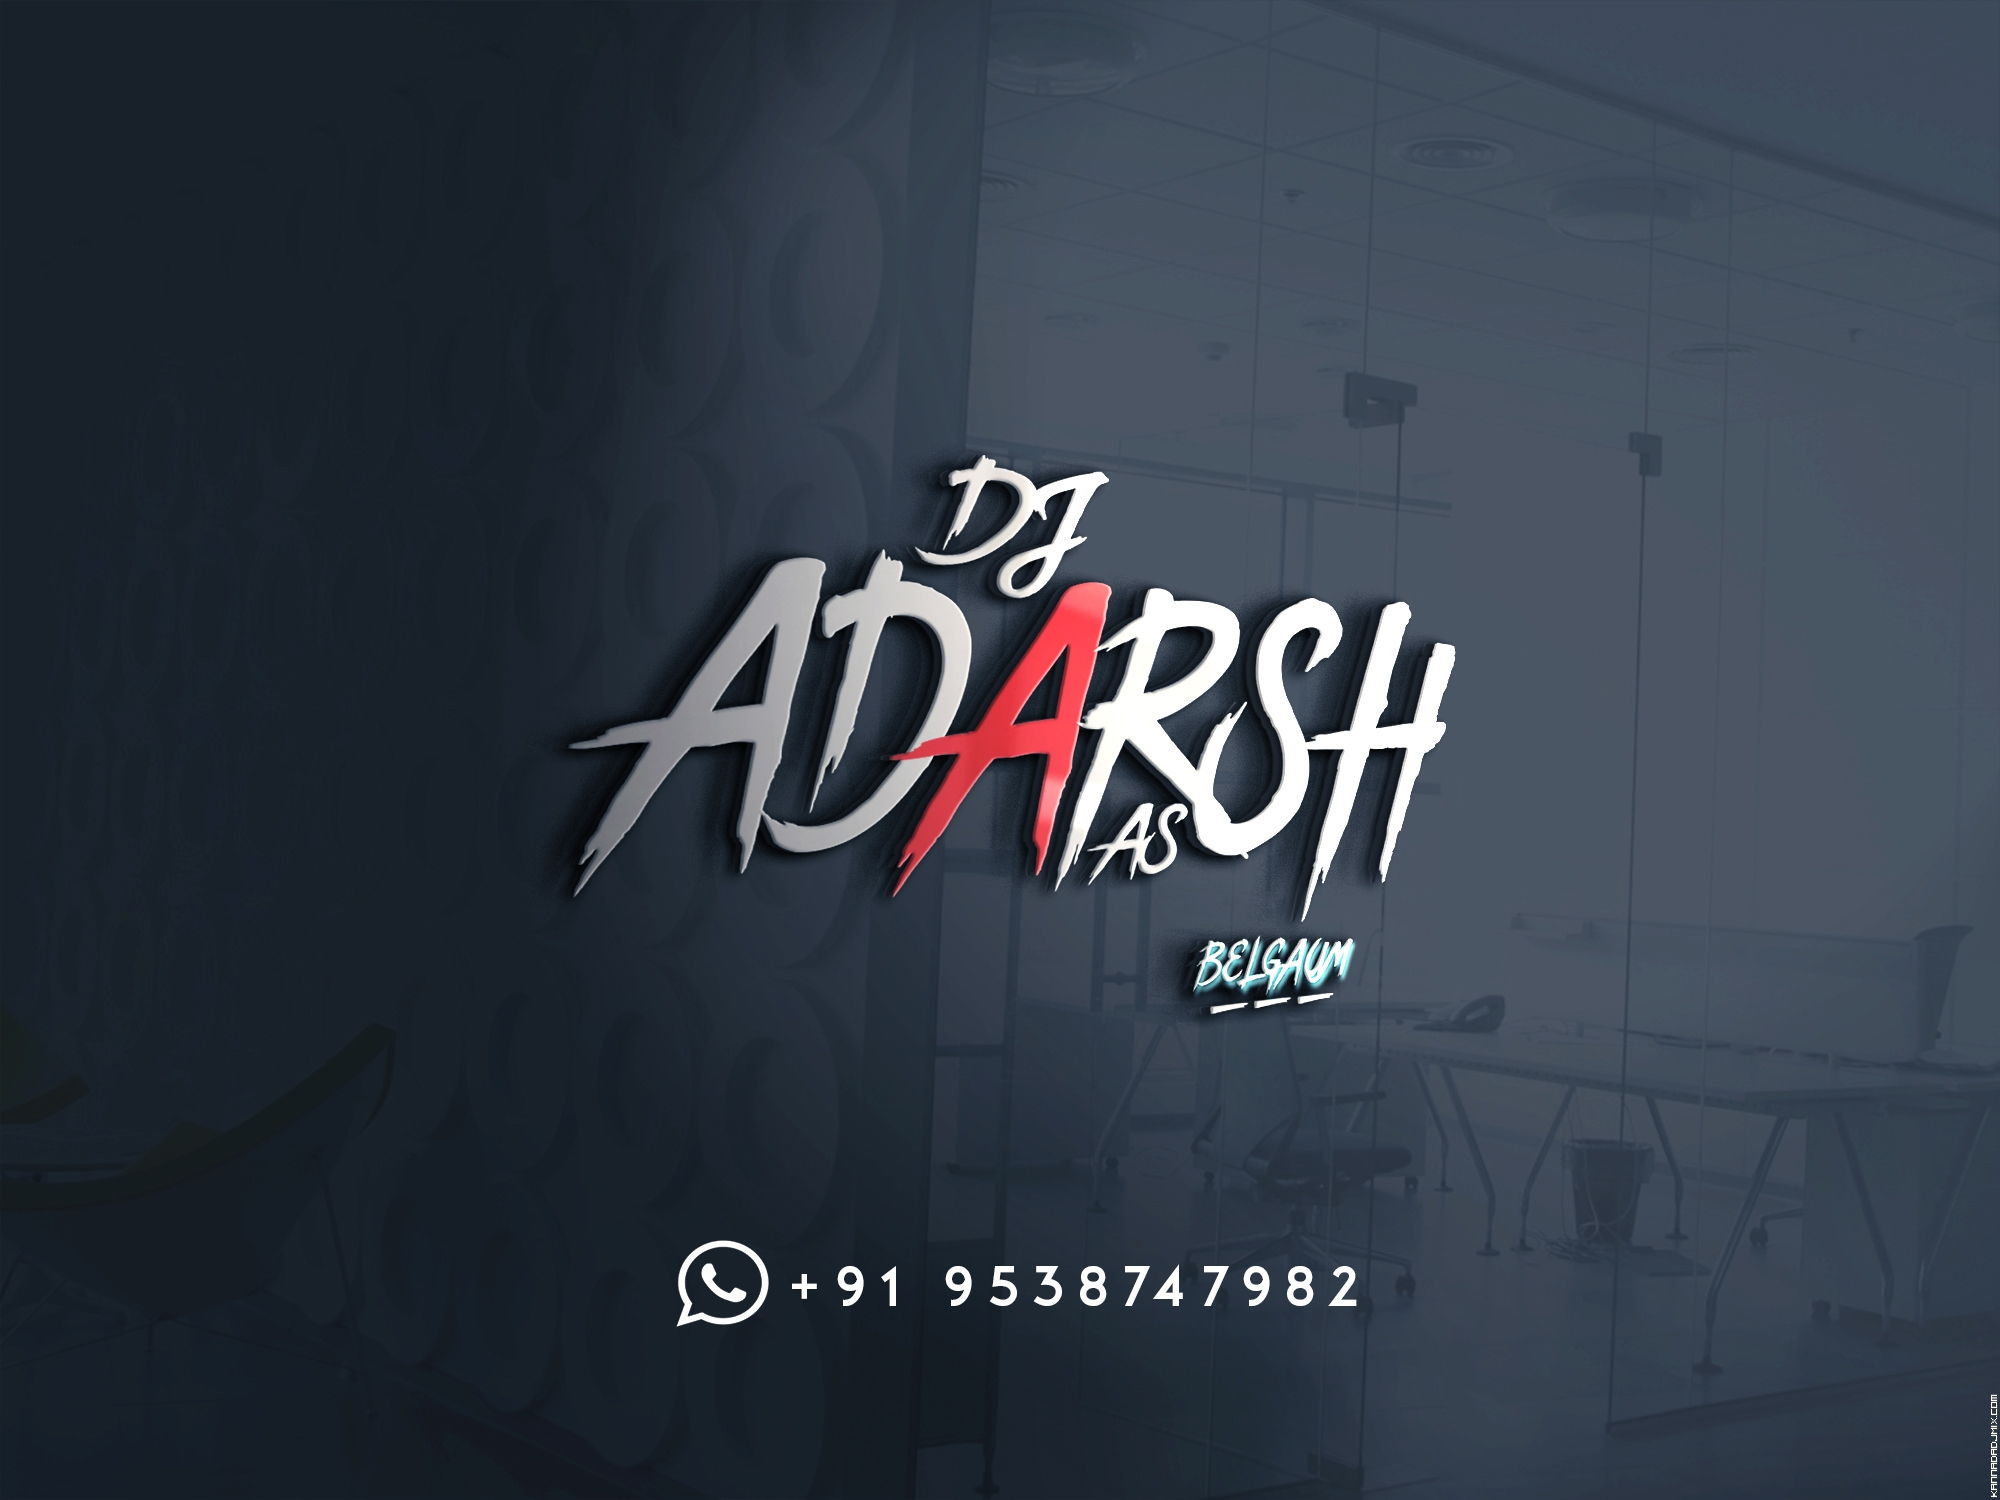 DHEERE_DHEERE_BOL_KOI_x_CRADLES_REMIX- DJ ADARSH AS BELGAUM 2k20.mp3